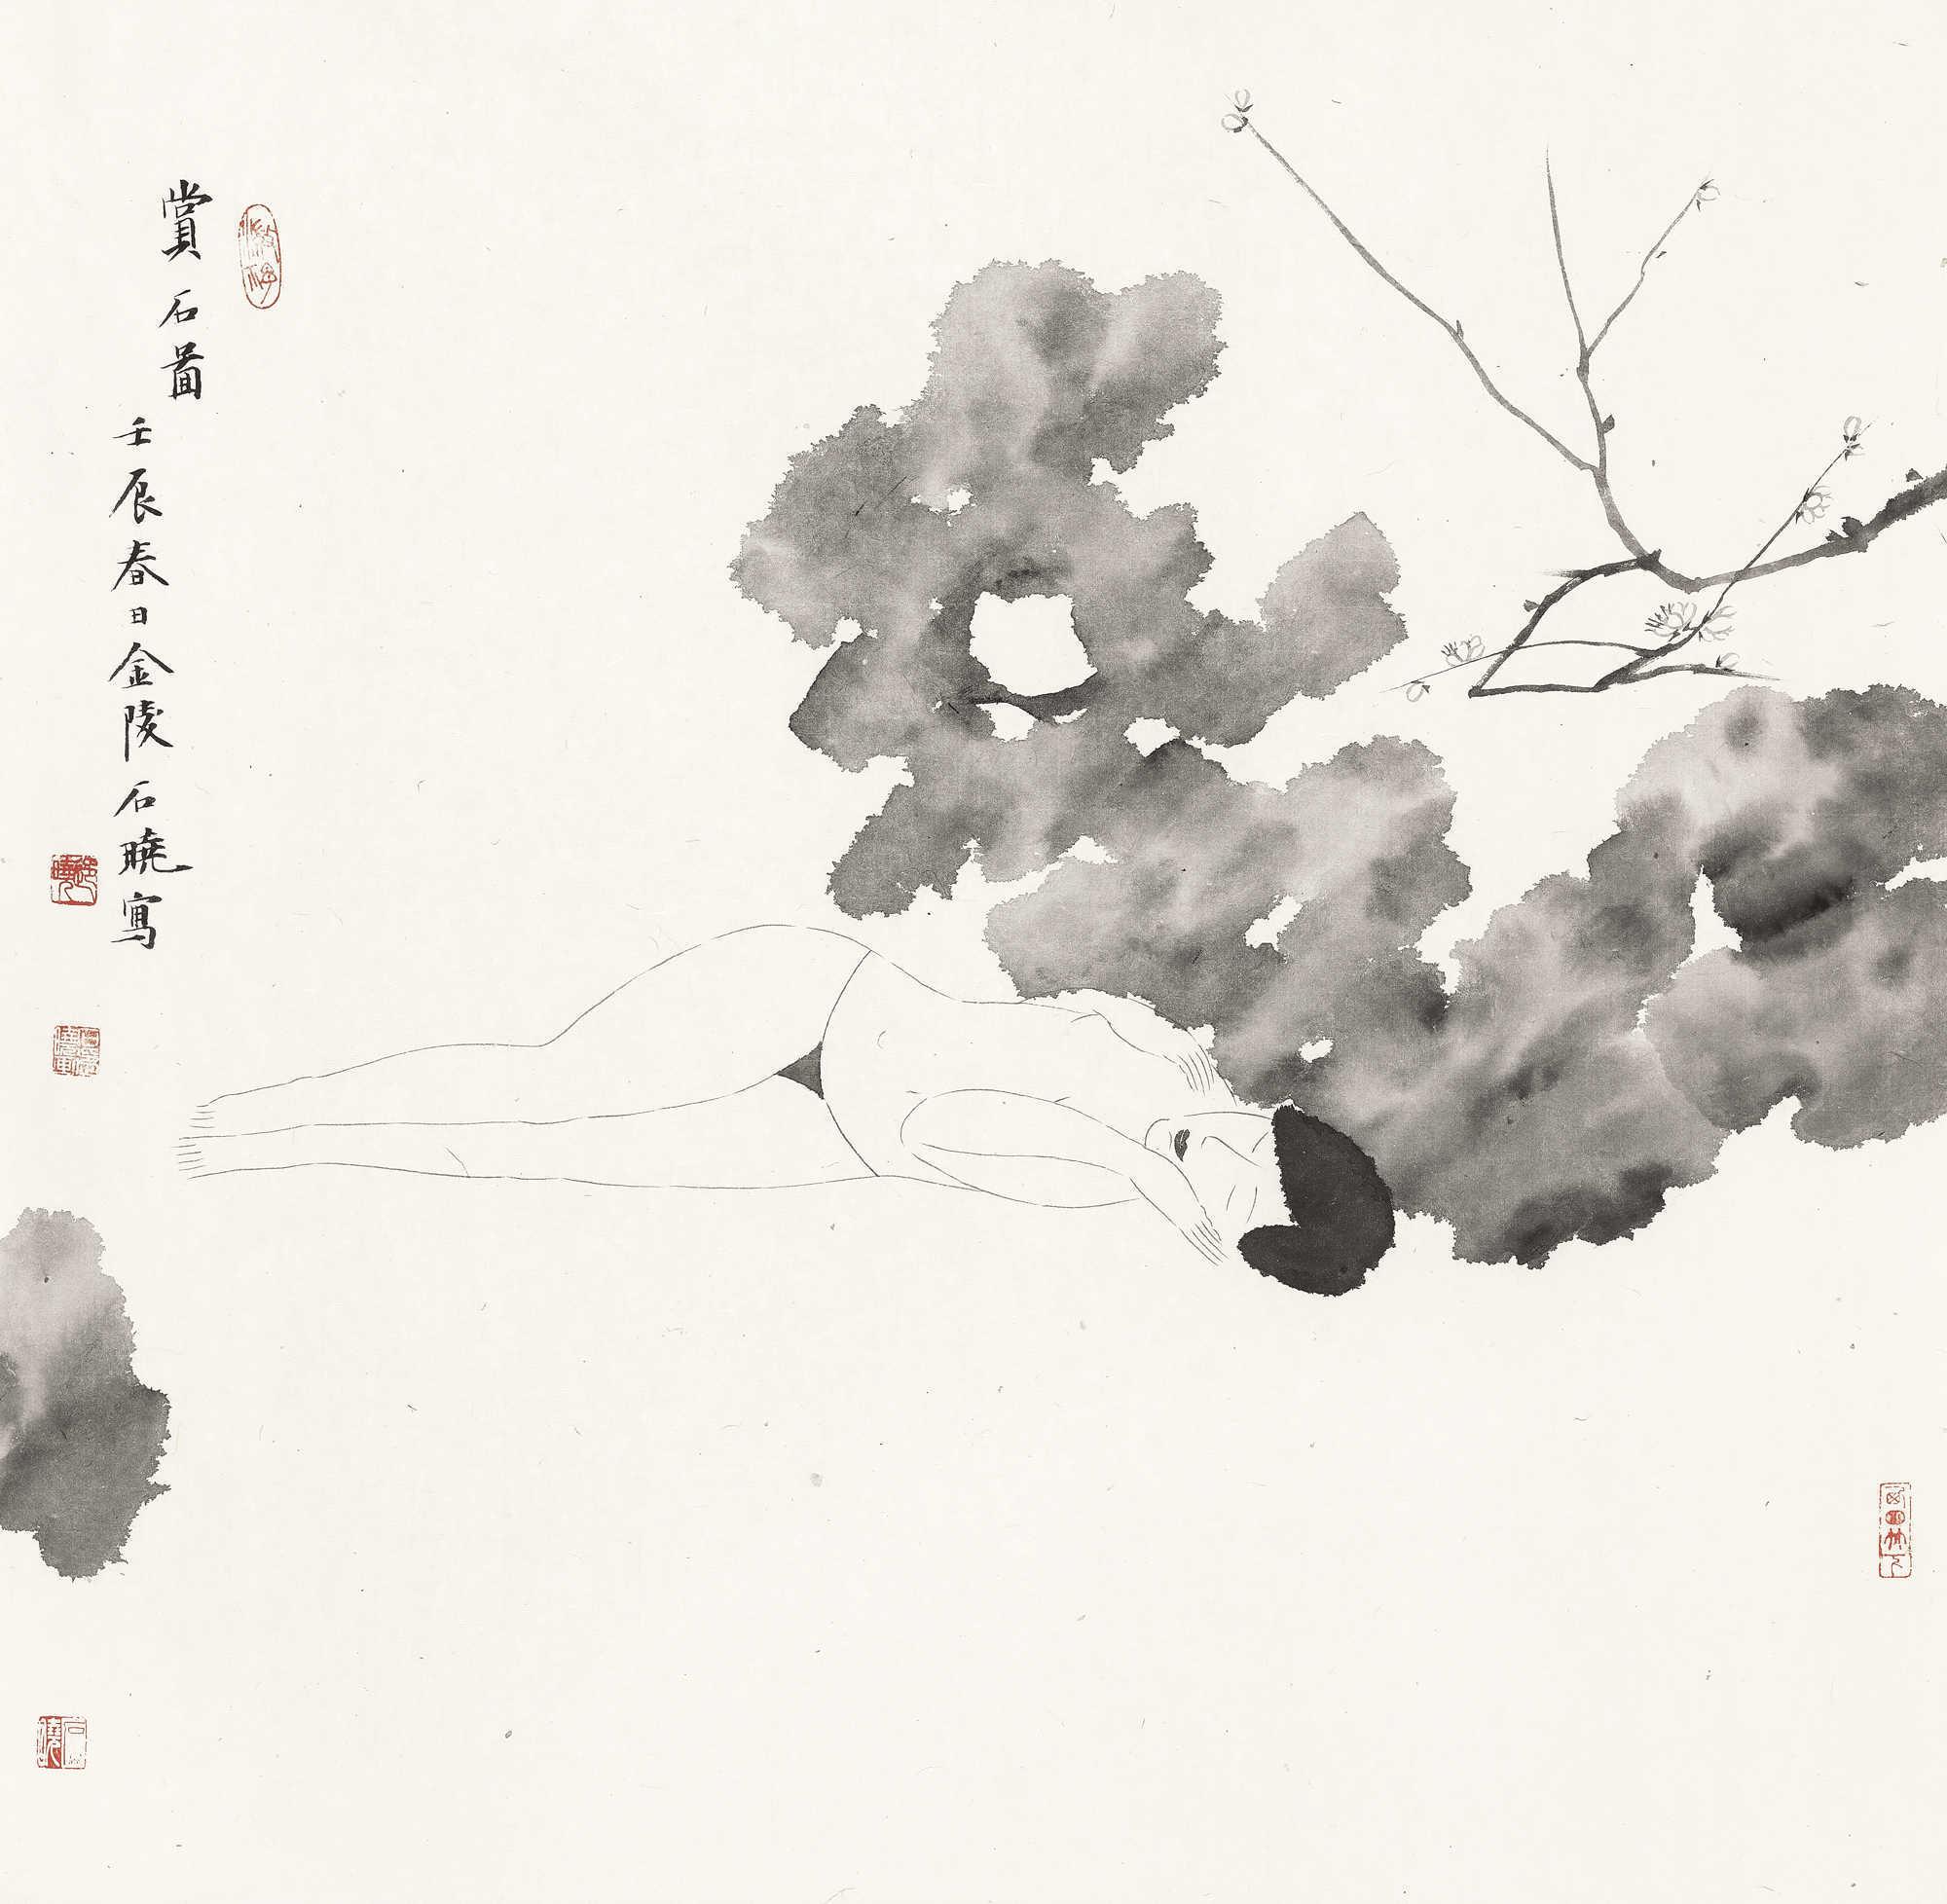 石晓-参展作品